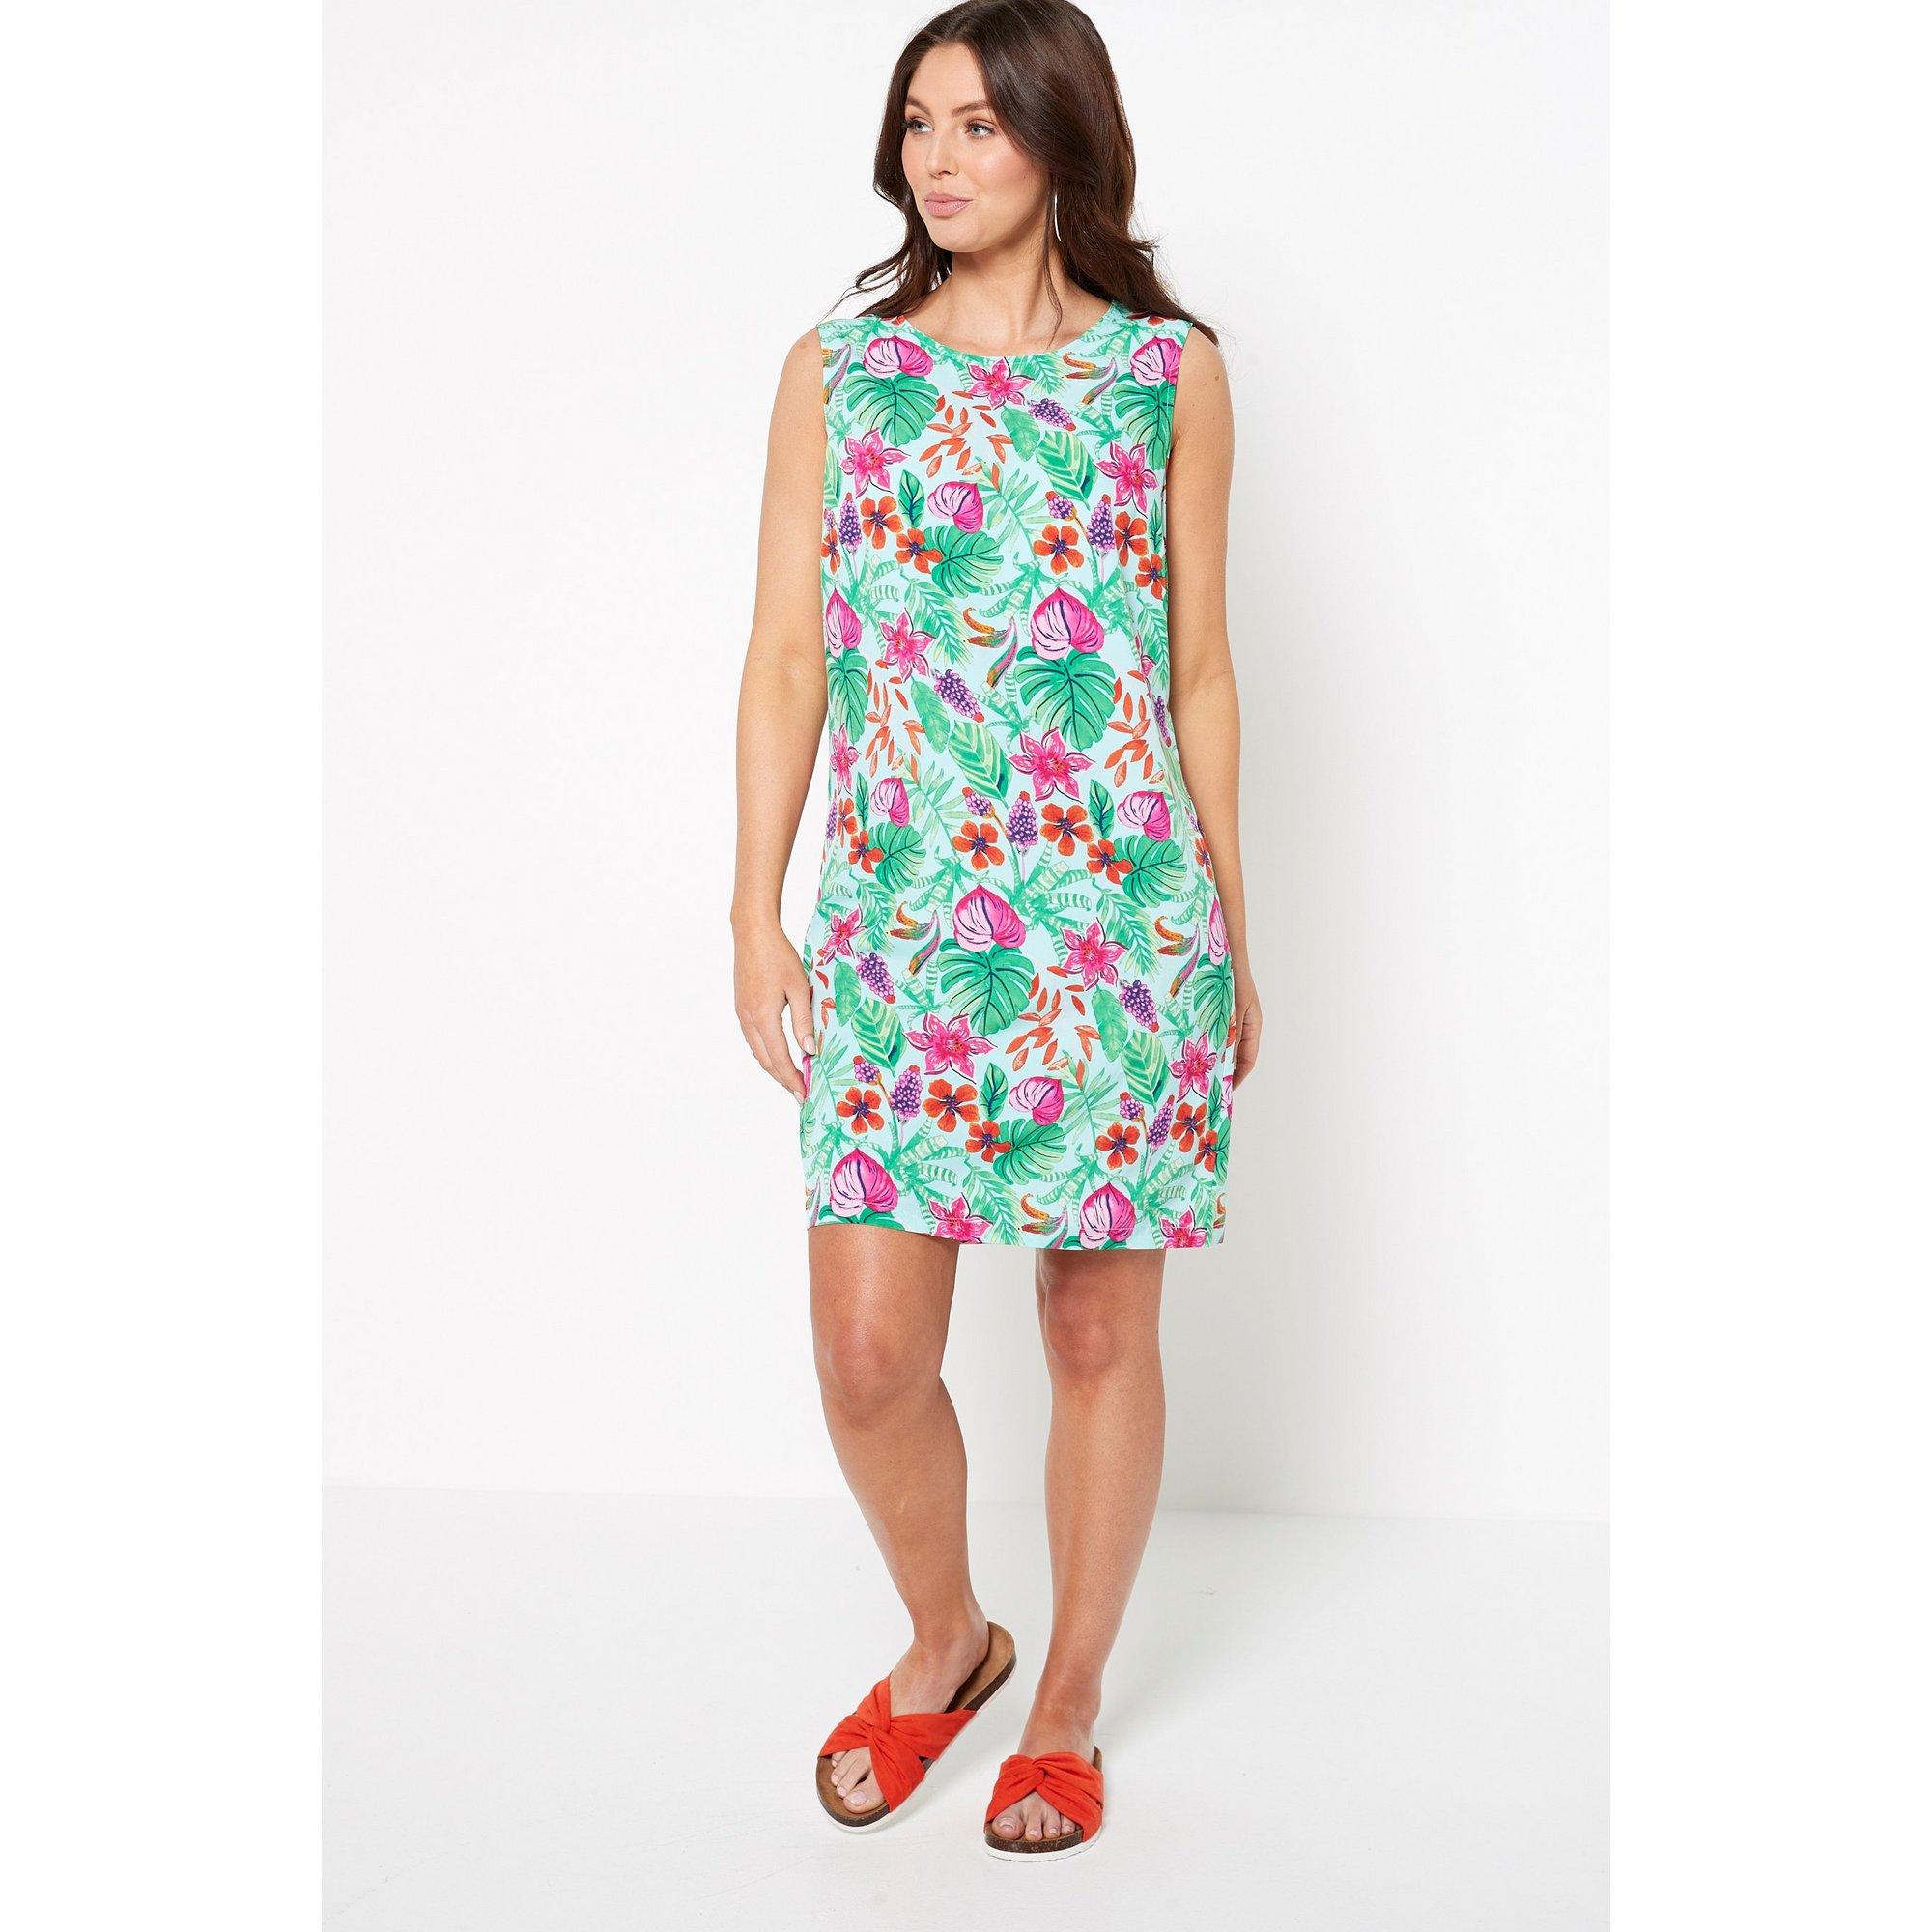 Image of Aqua Floral Printed Sleeveless Shift Dress